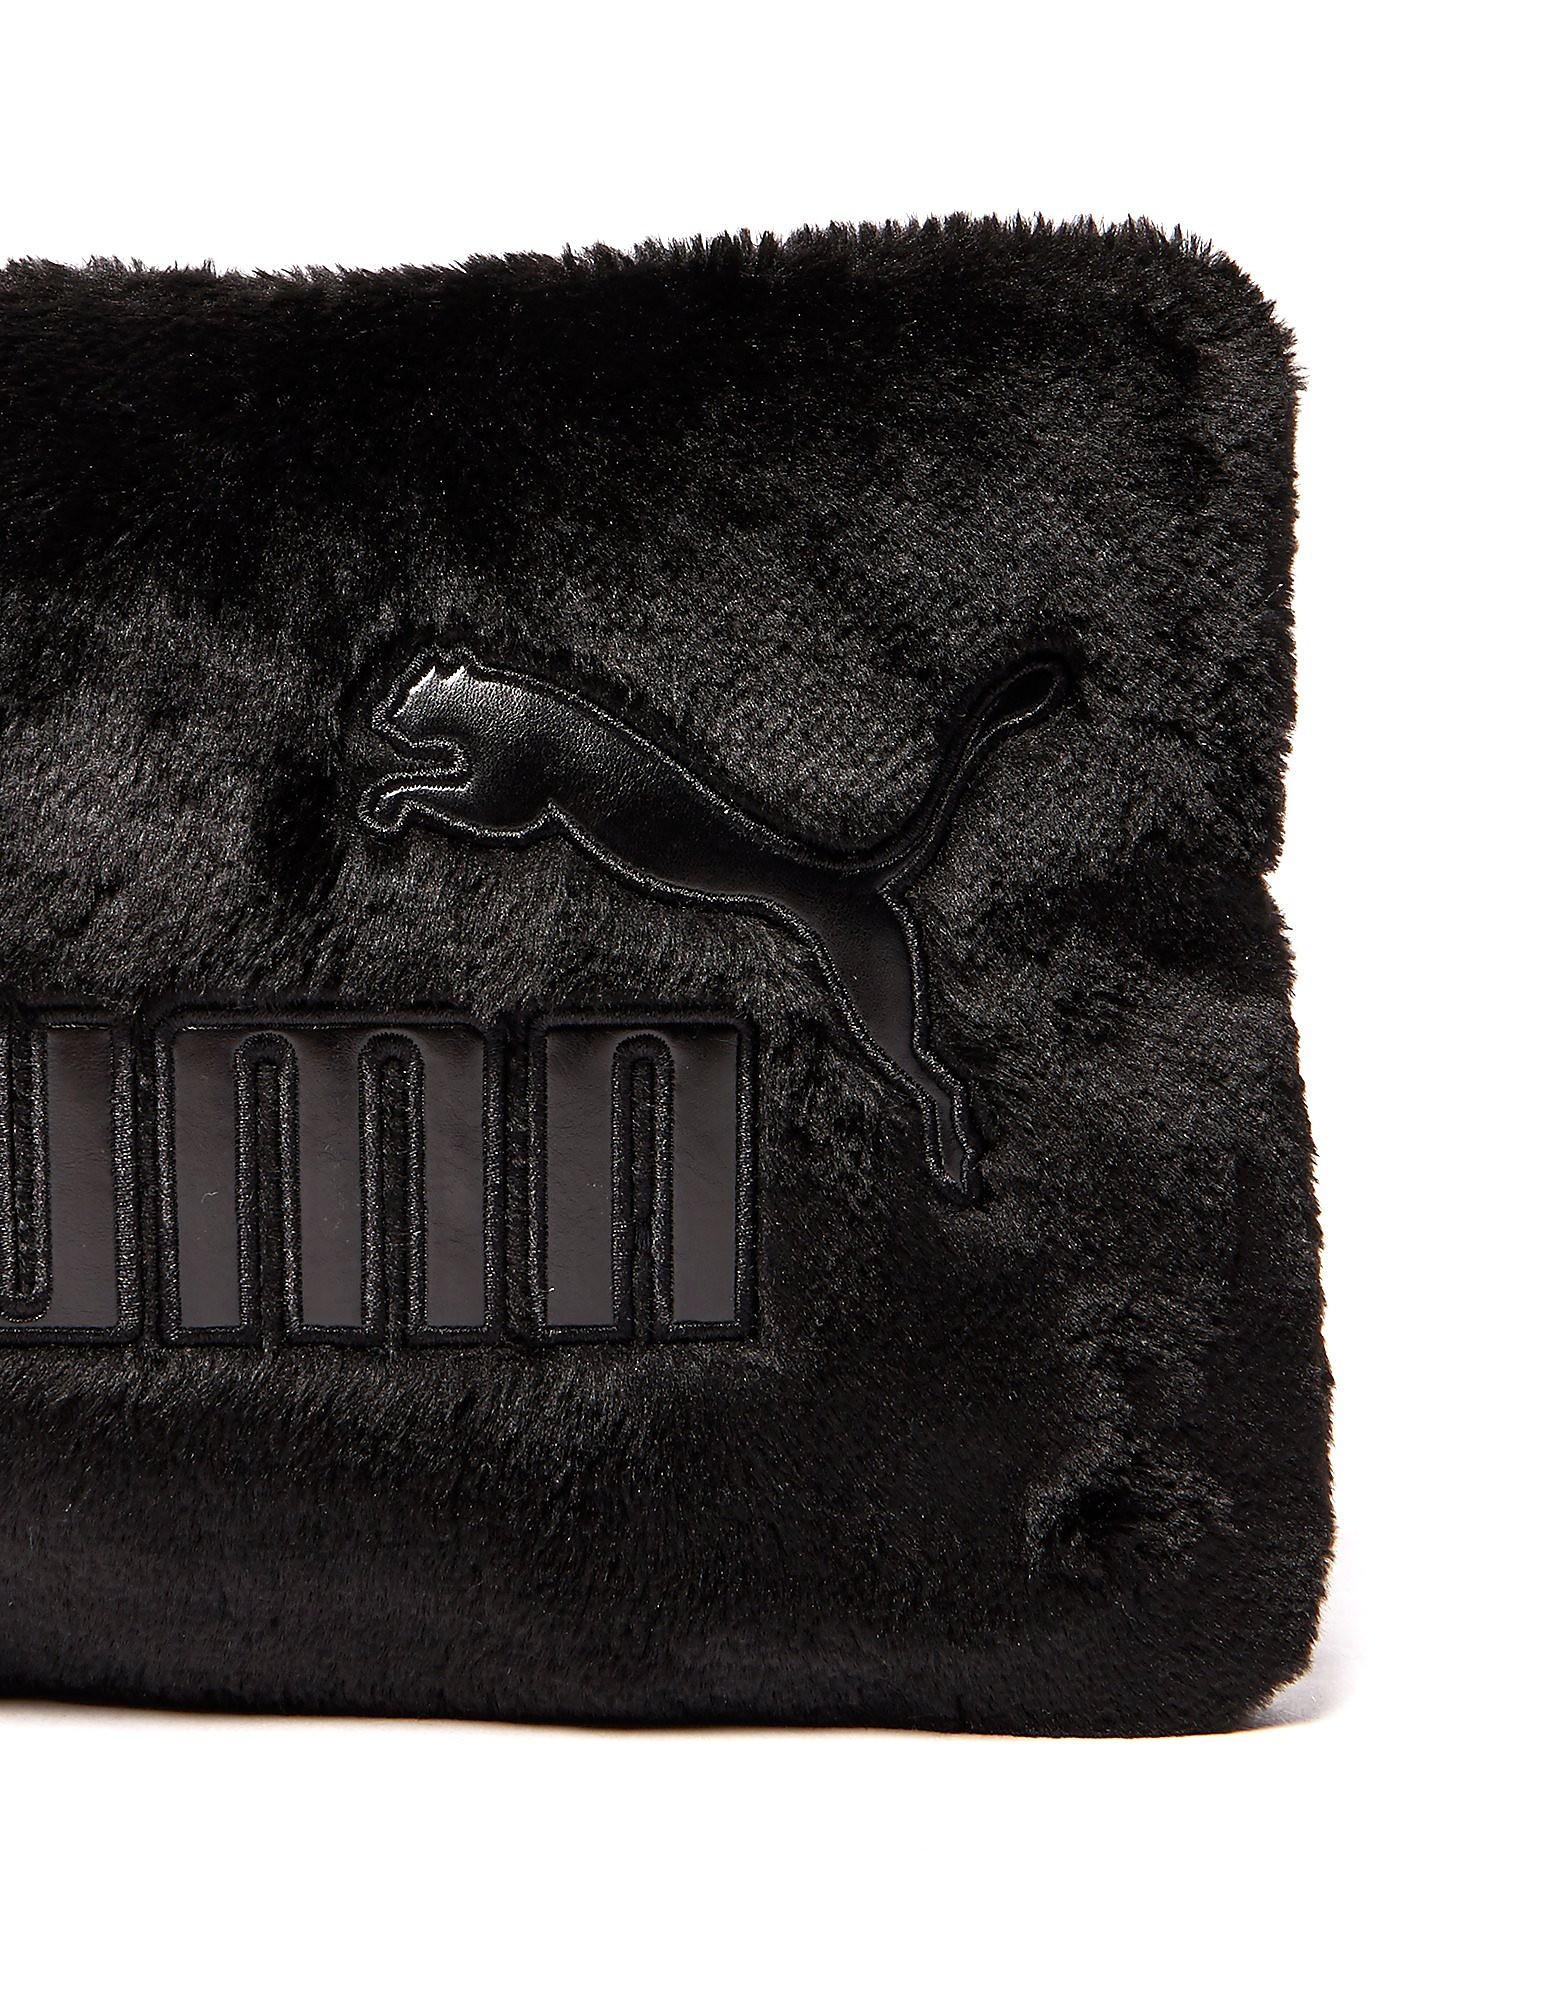 PUMA Fur Pochette